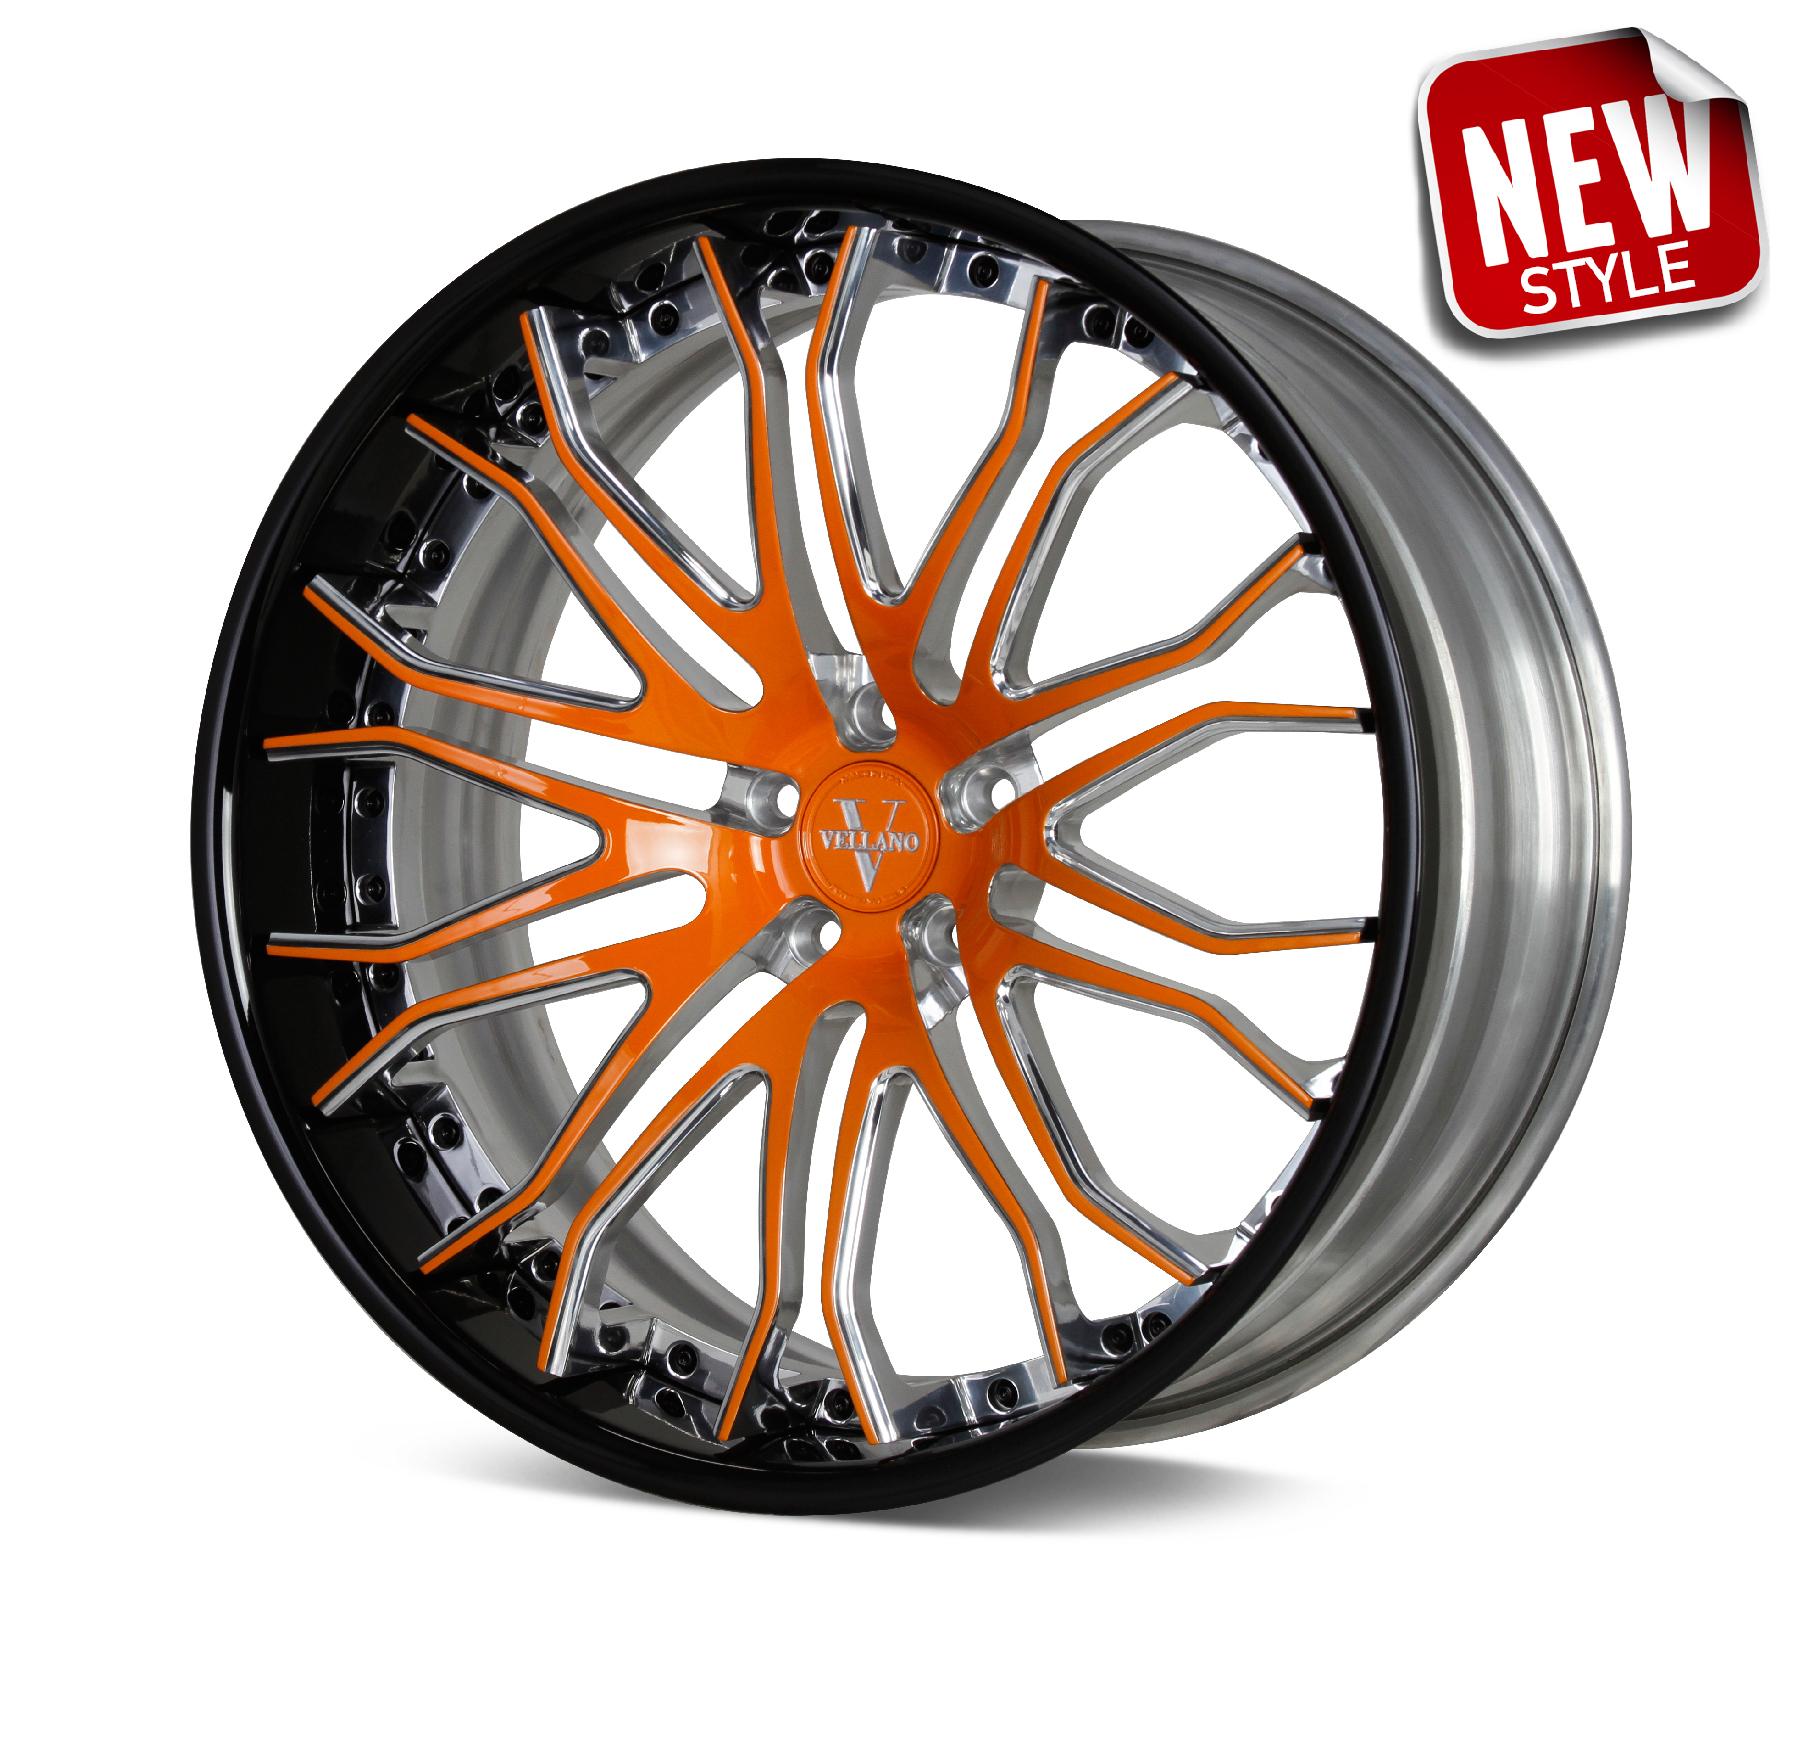 Vellano VCN forged wheels